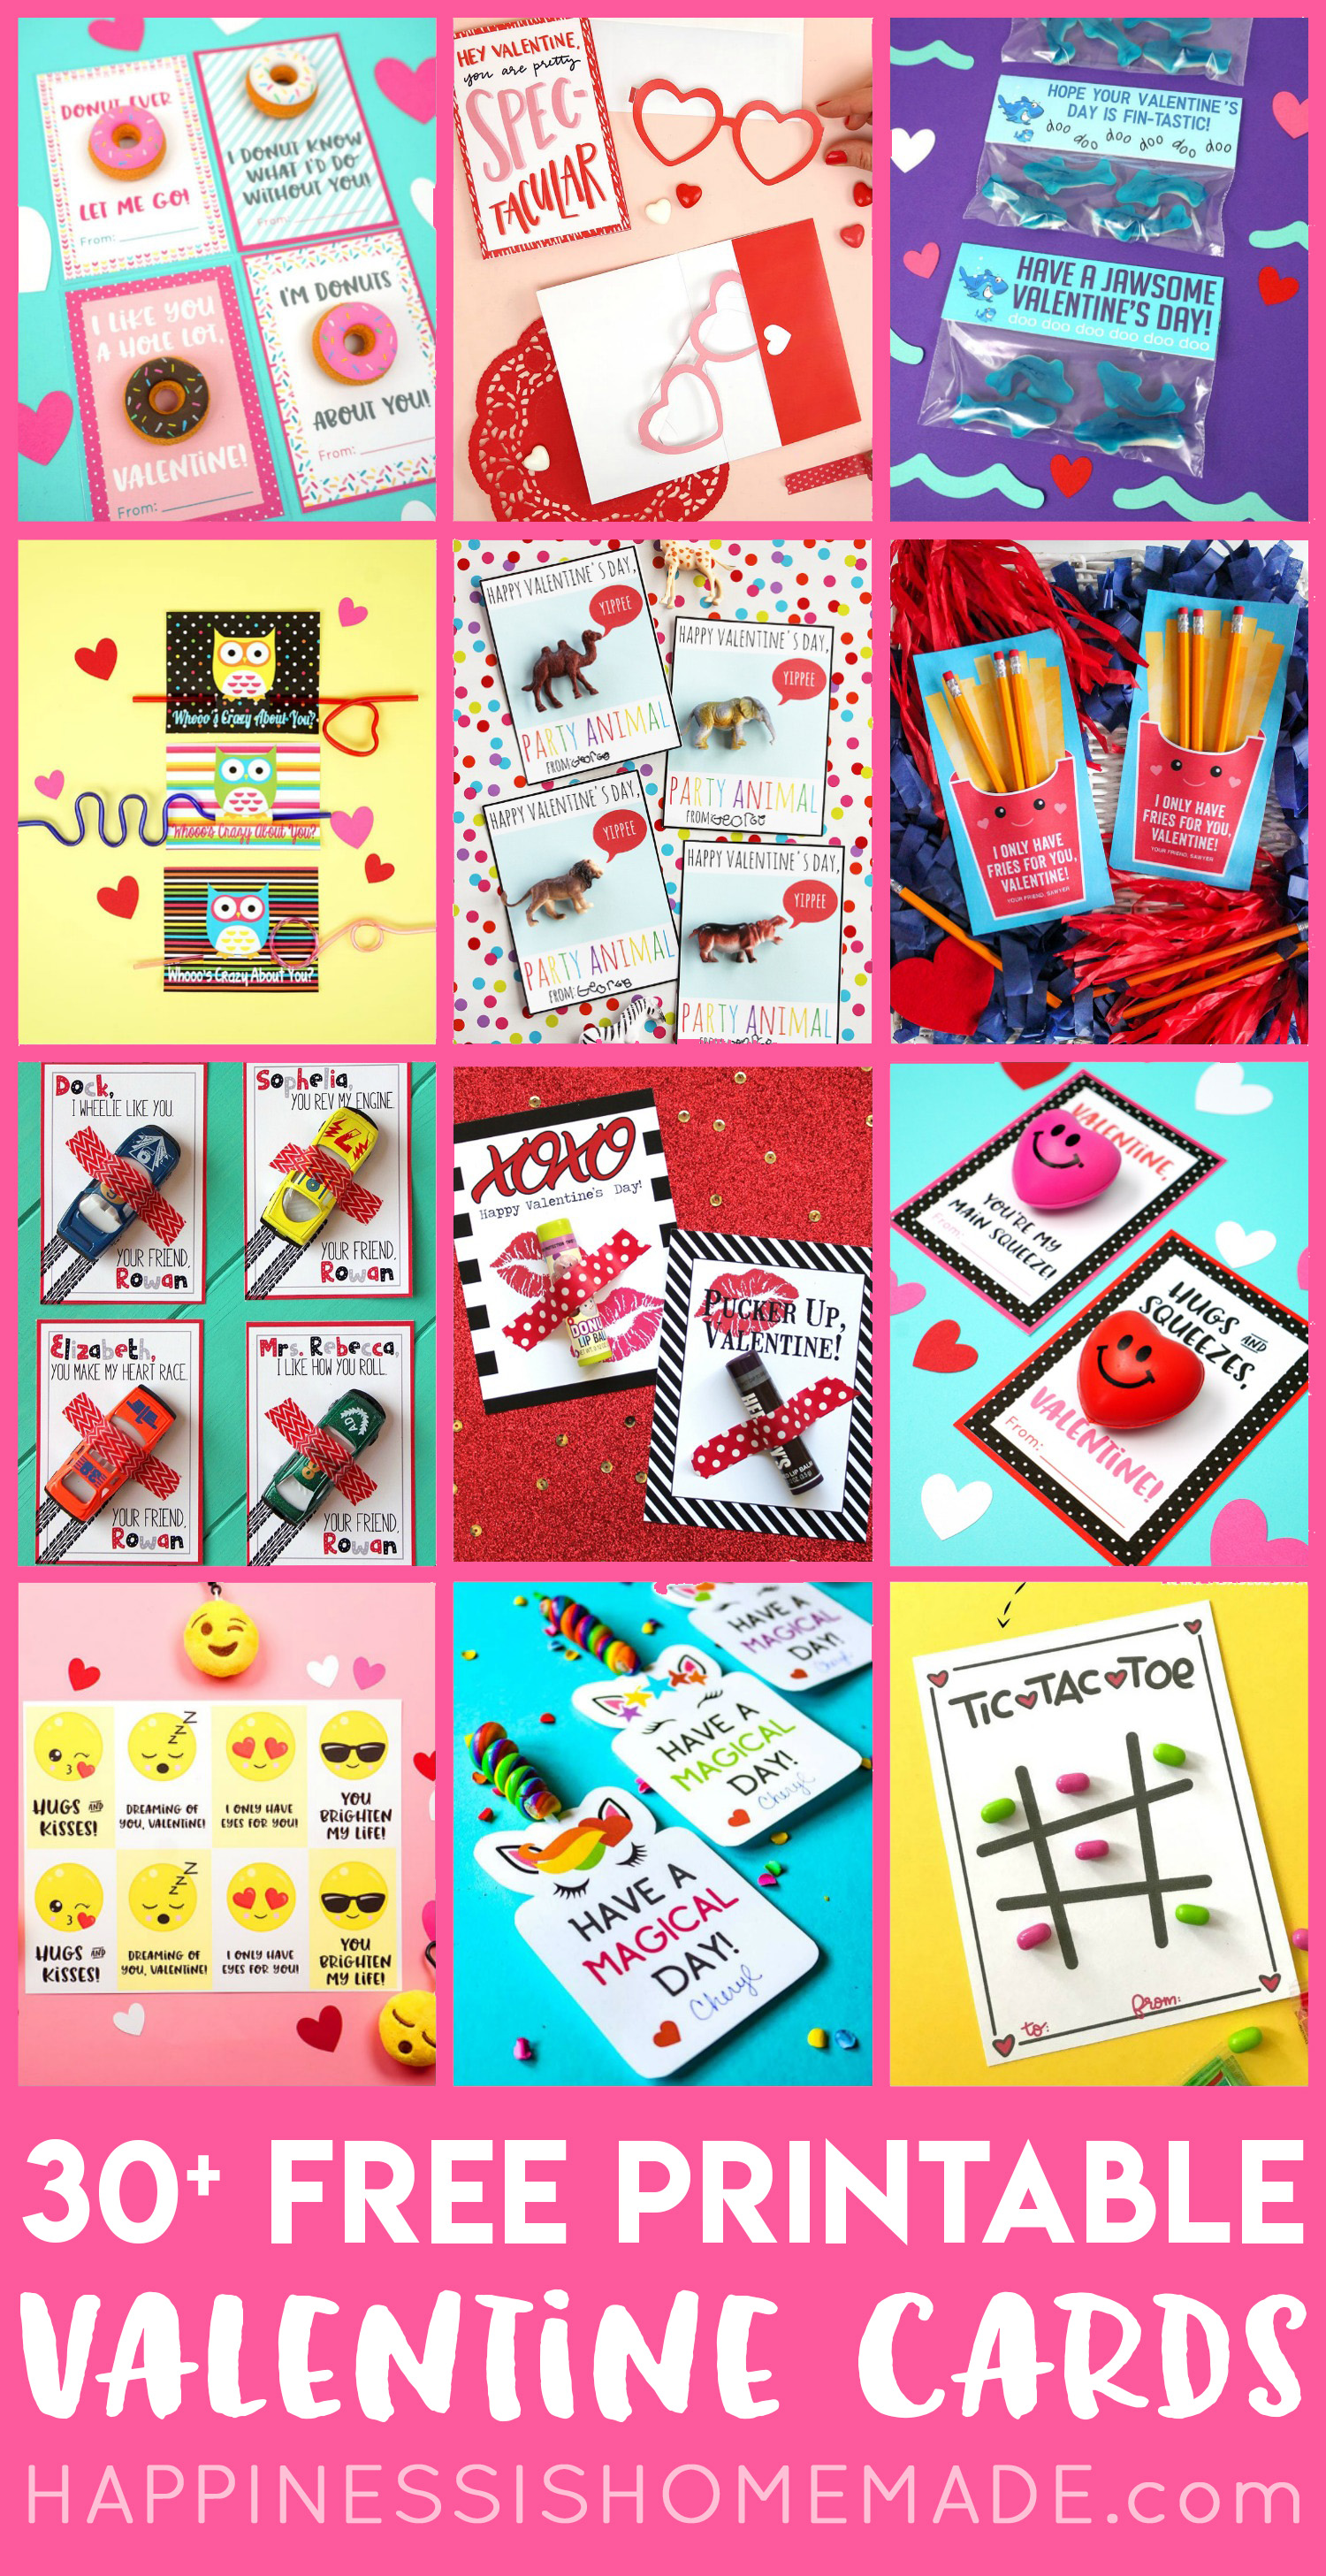 30 Free Printable Valentine Cards for Valentine's Day